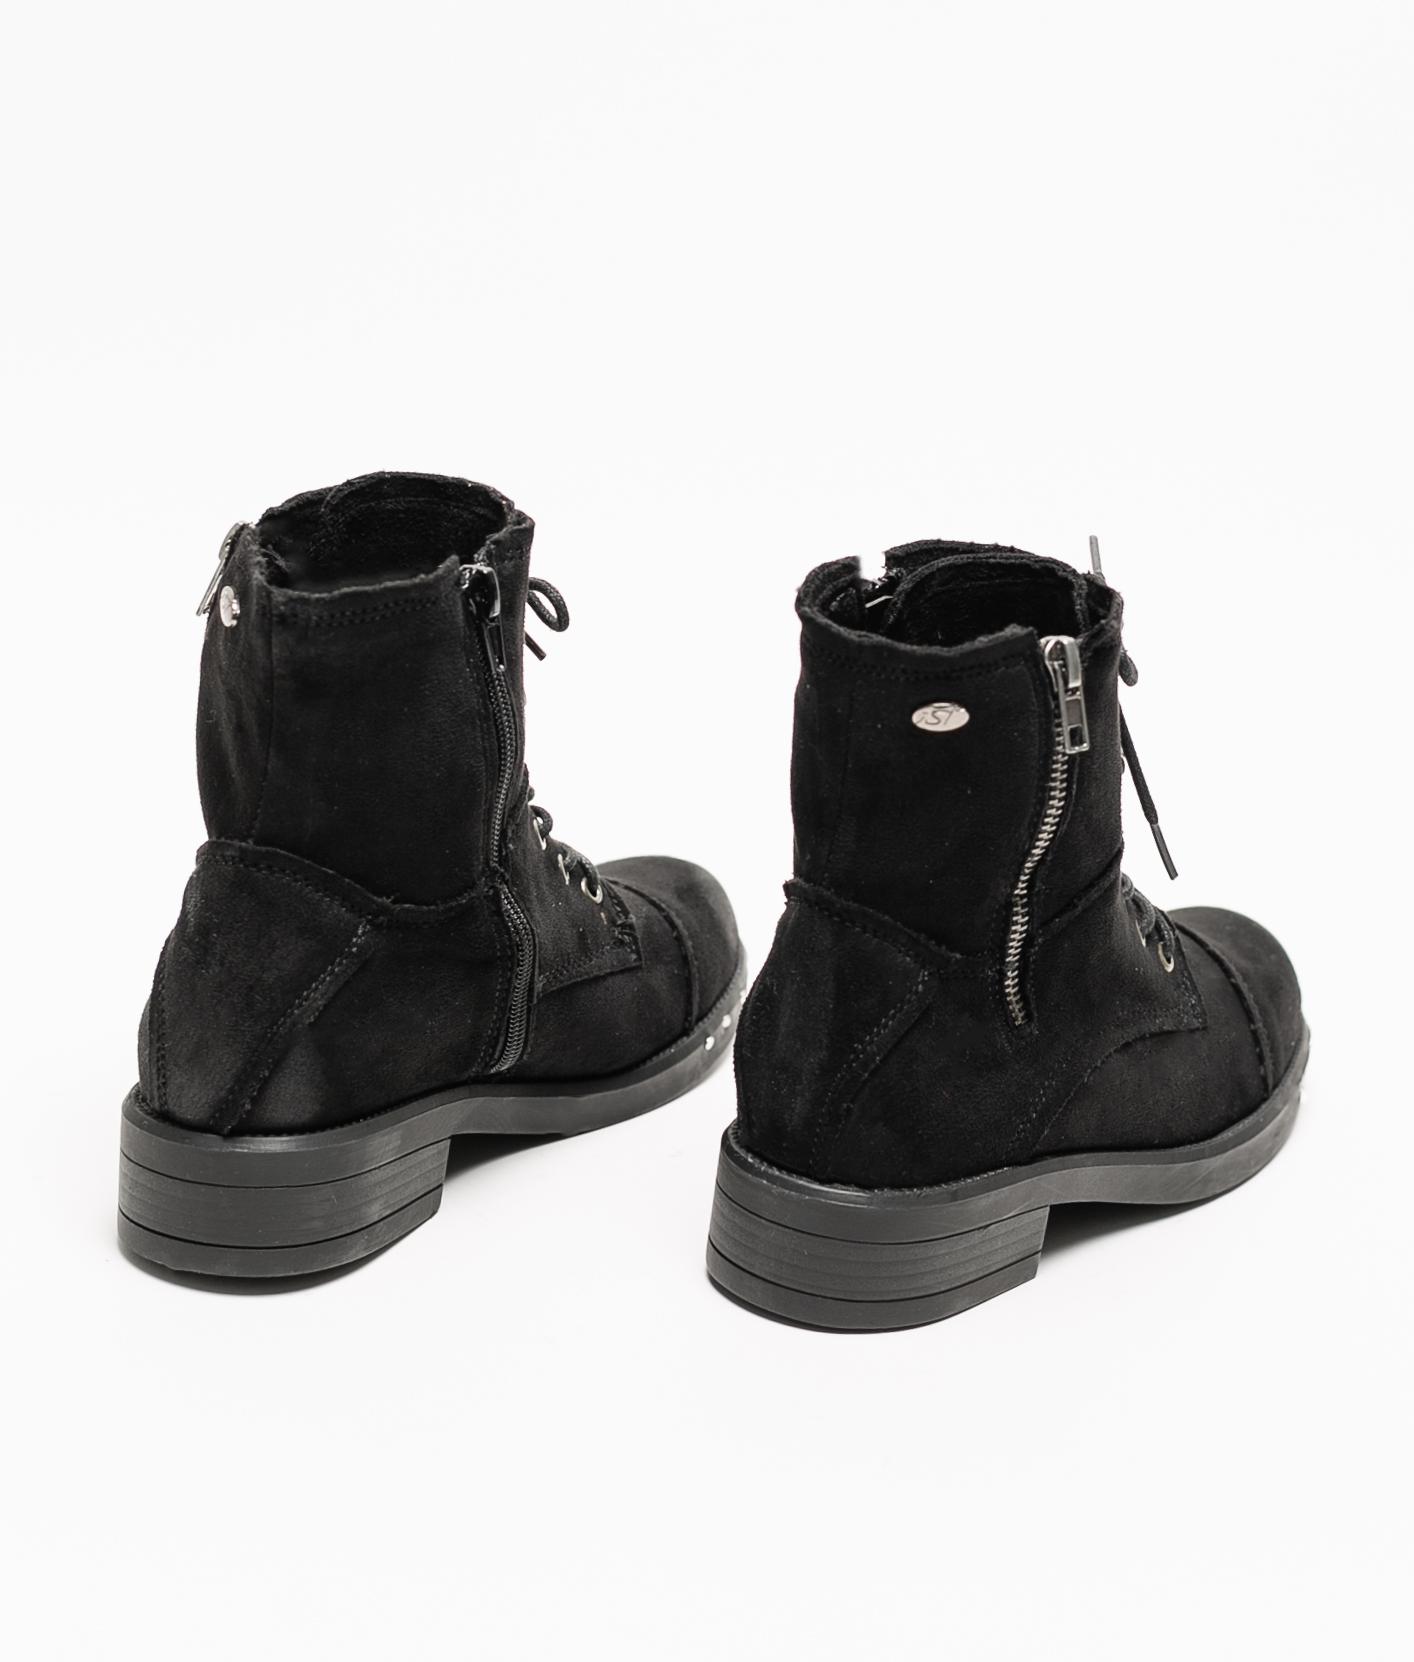 LOWW BOOT PISLEY - BLACK